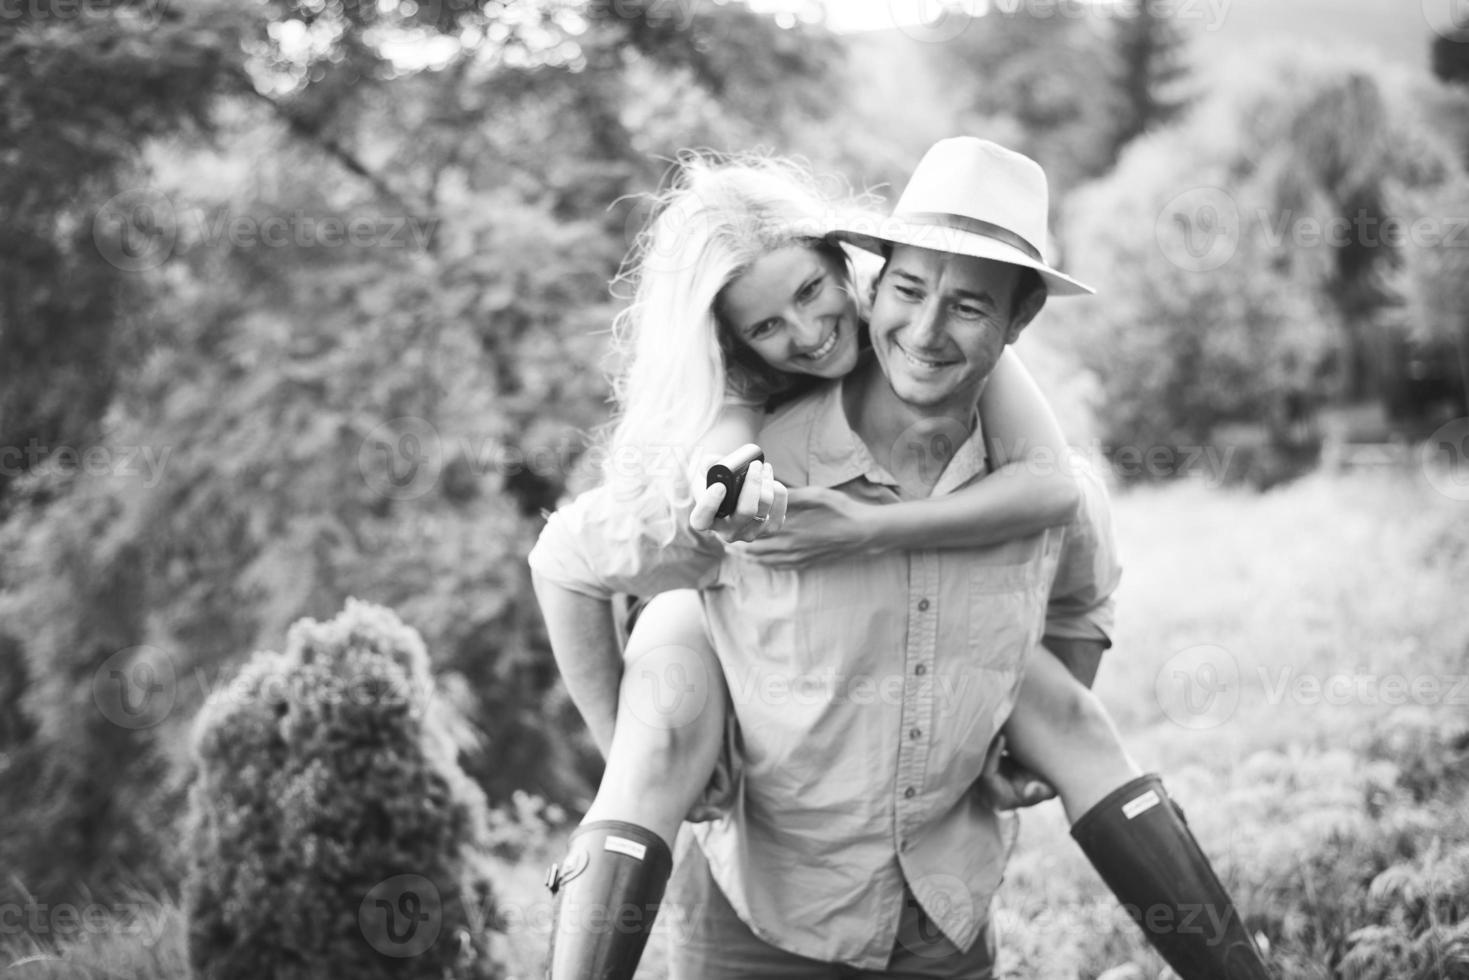 Happy loving couple on engagement day photo